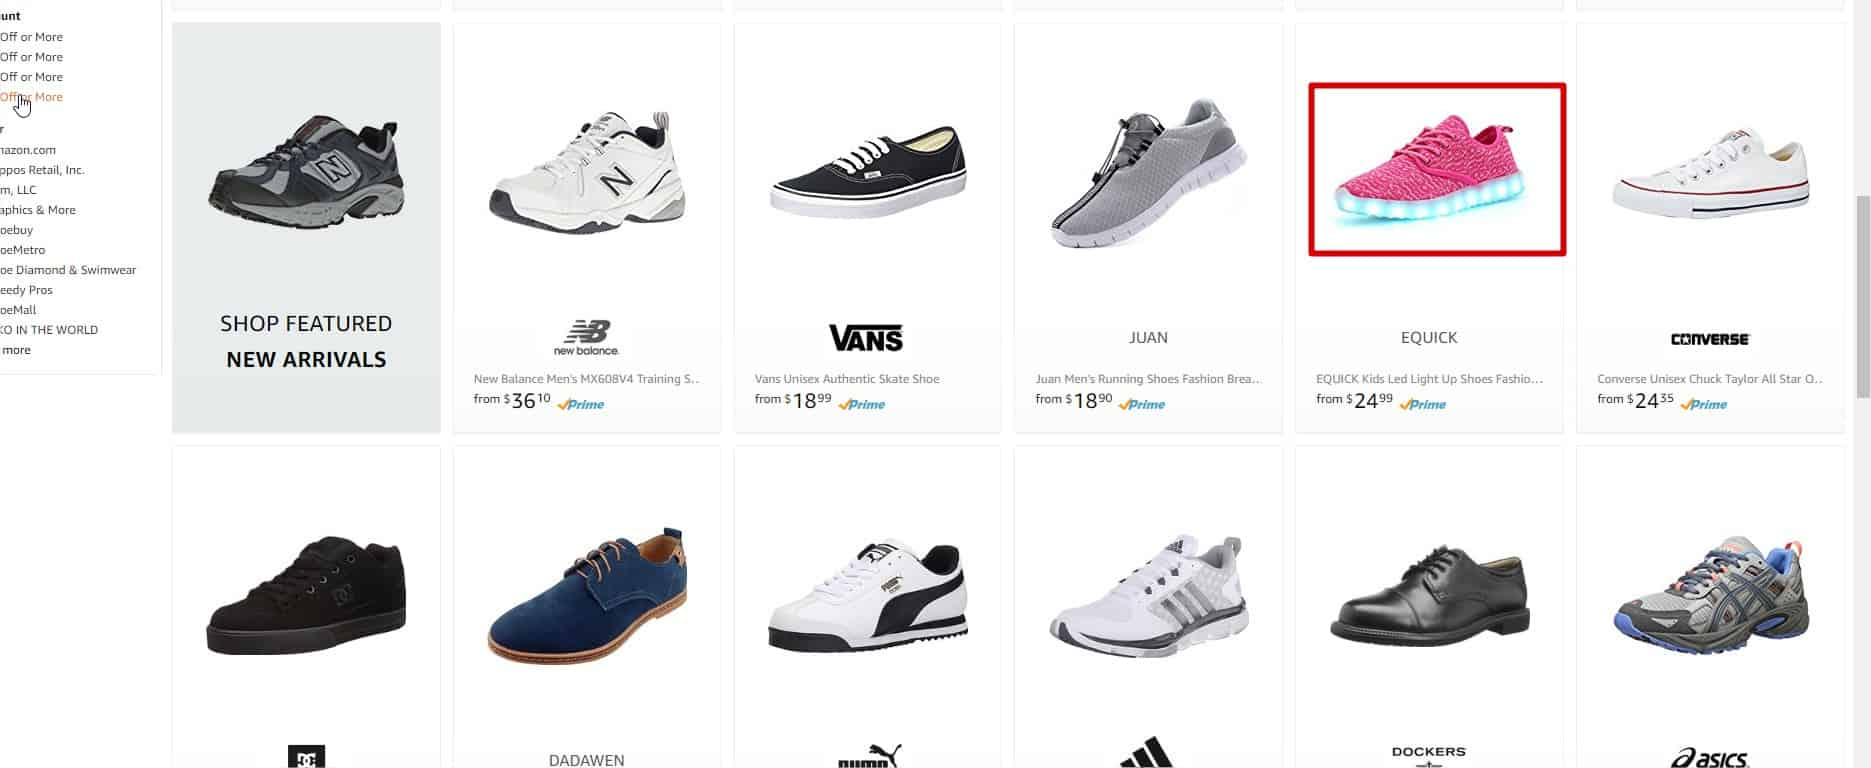 dsm tool ebay amazon drop shipping automation platform